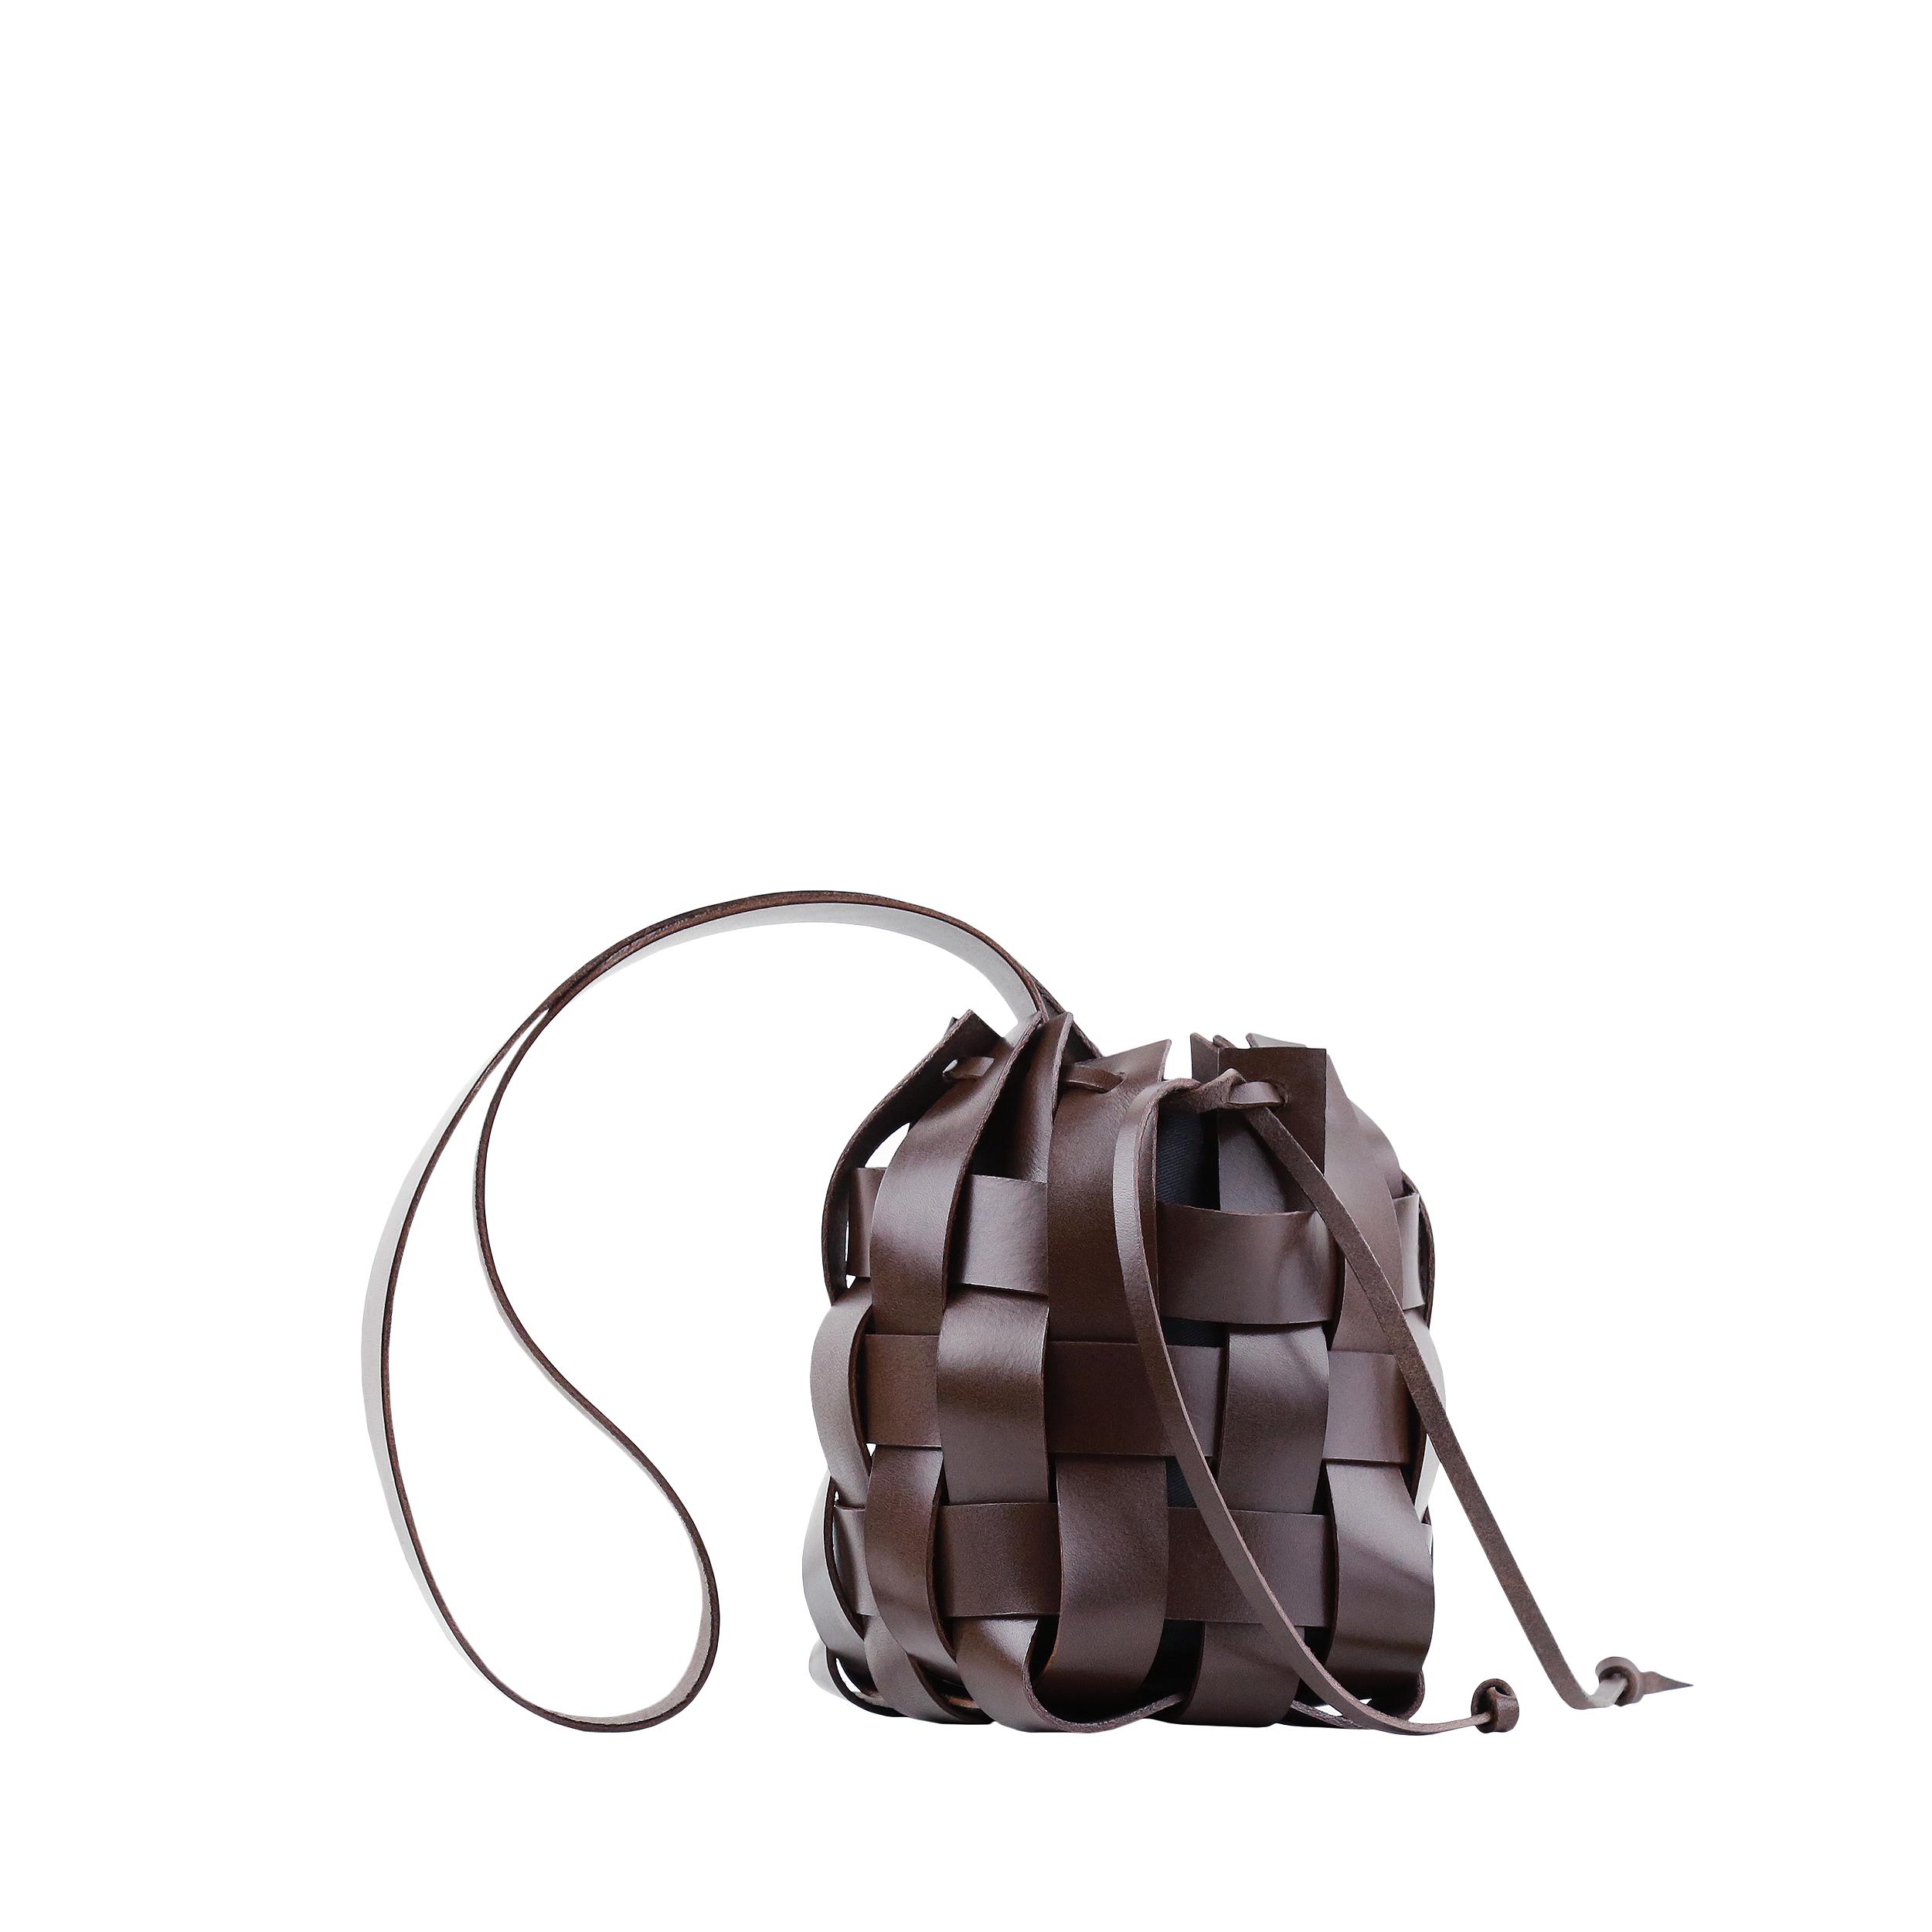 TorbaPANE Woven Basket Bag Dark Chocolate-1